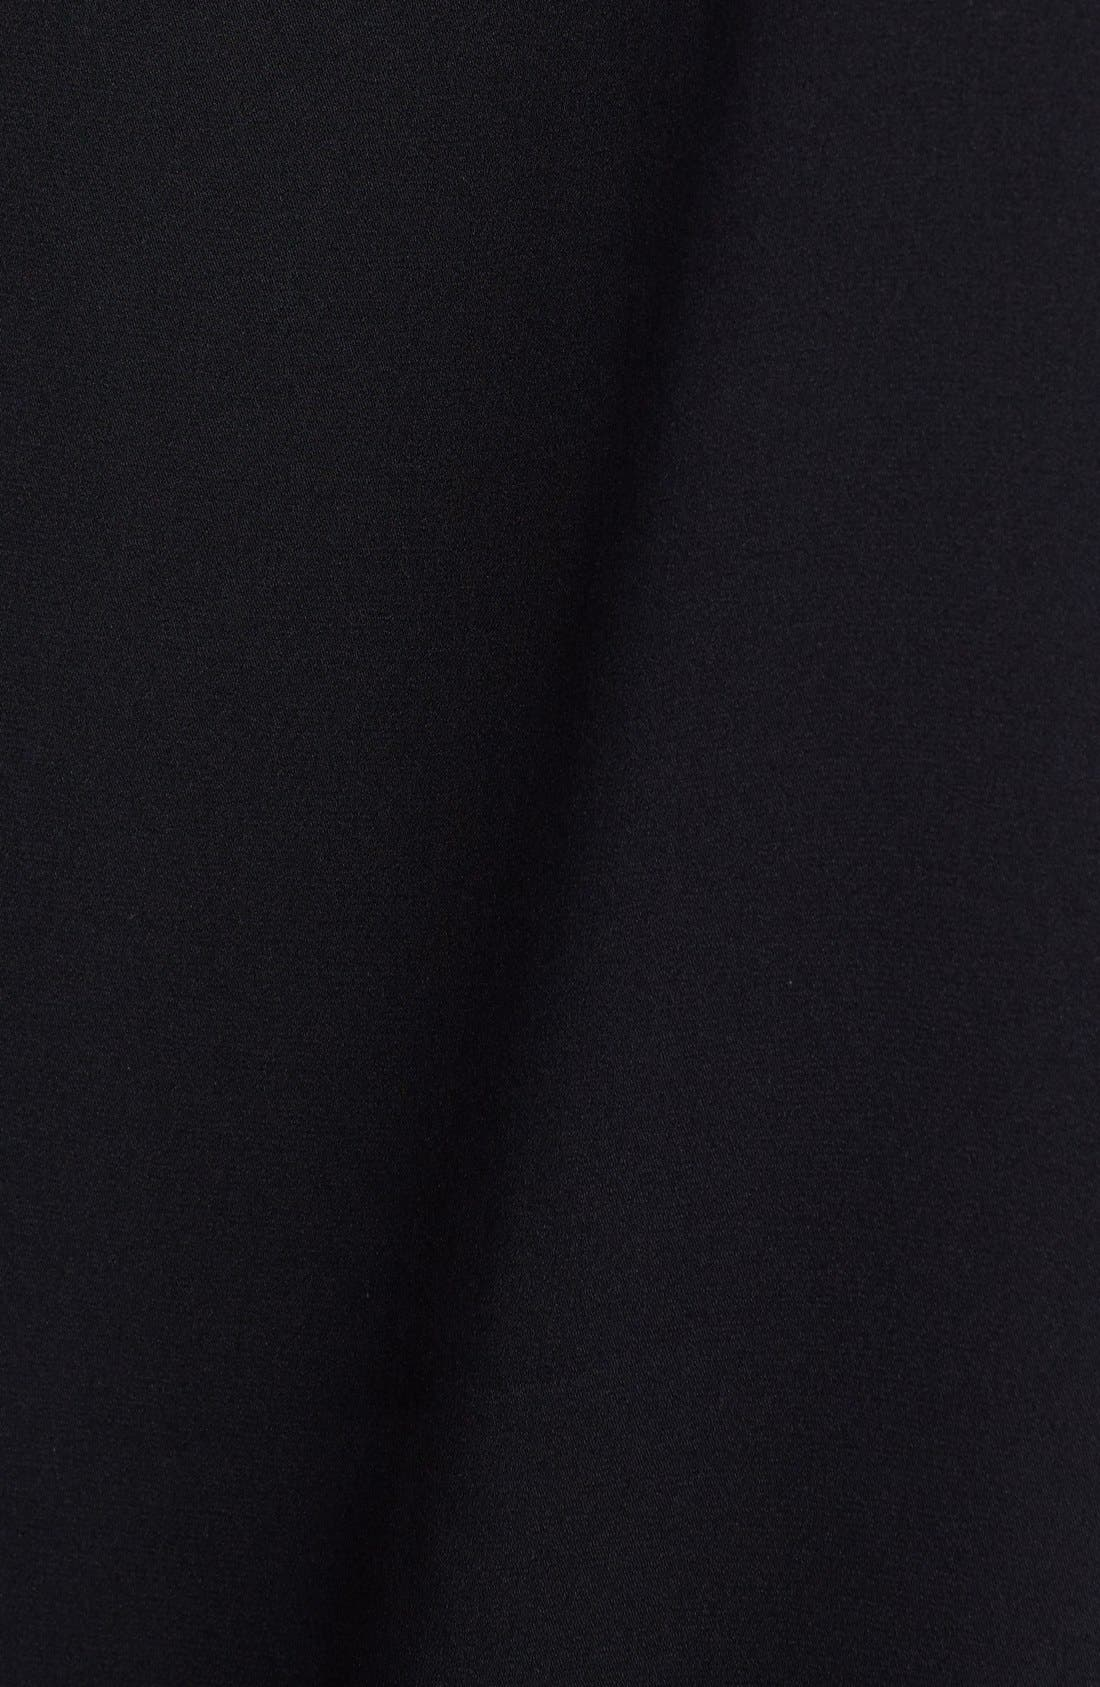 Alternate Image 3  - Vince 'Sculptured' Stretch Silk Blouse